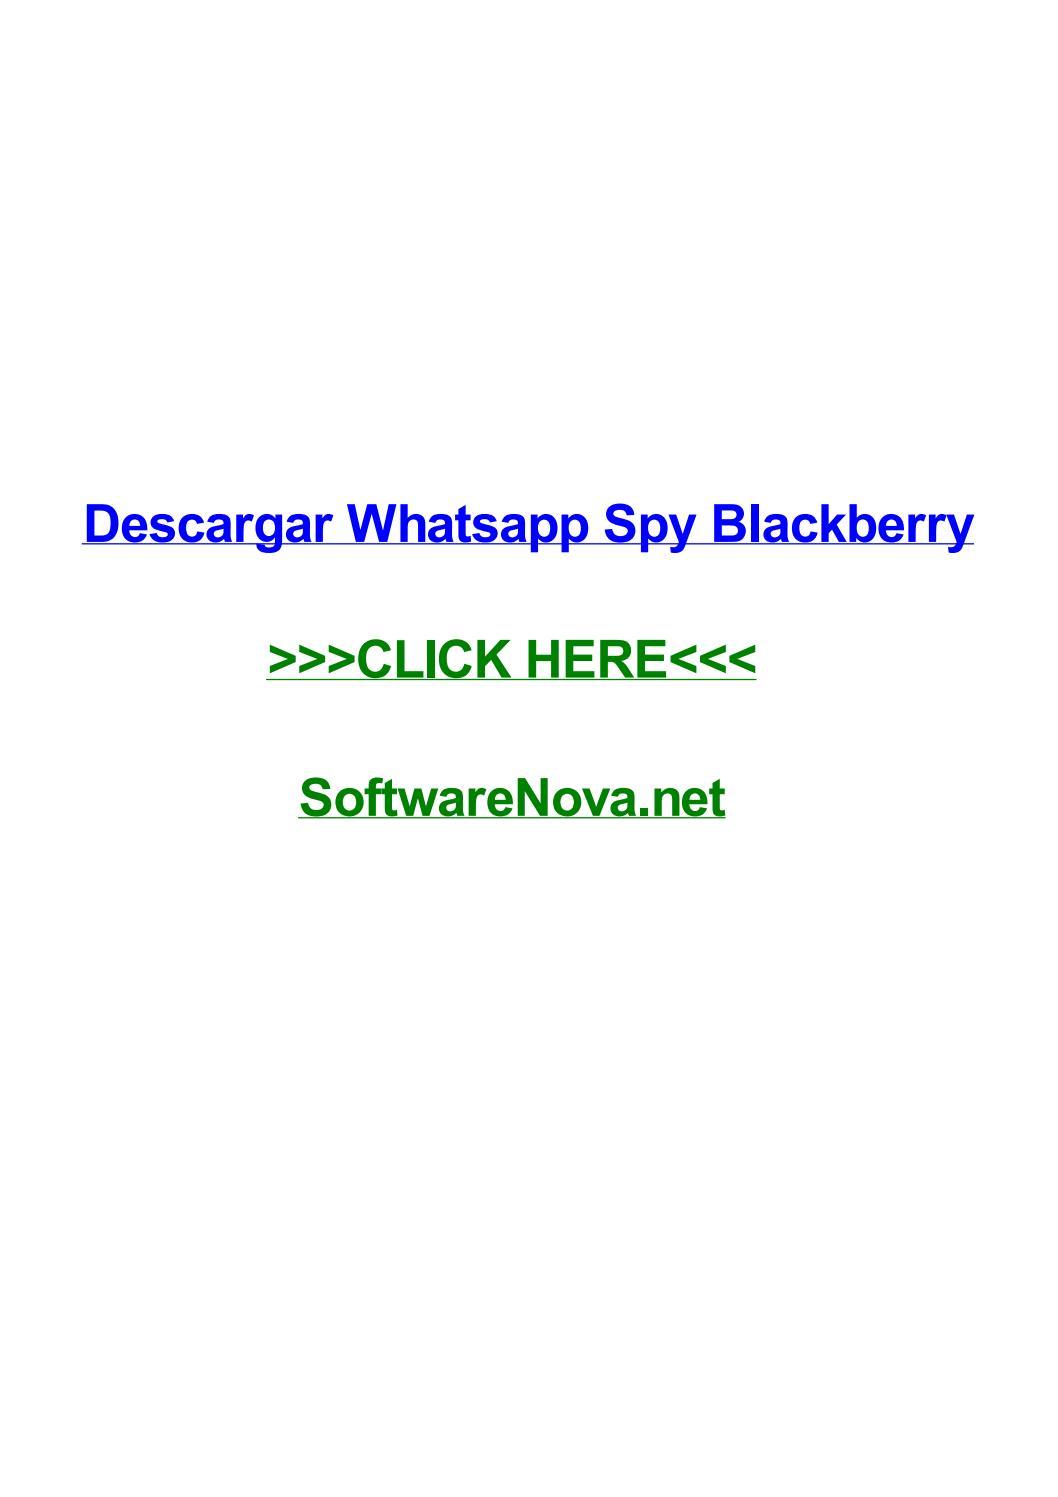 whatsapp spy blackberry